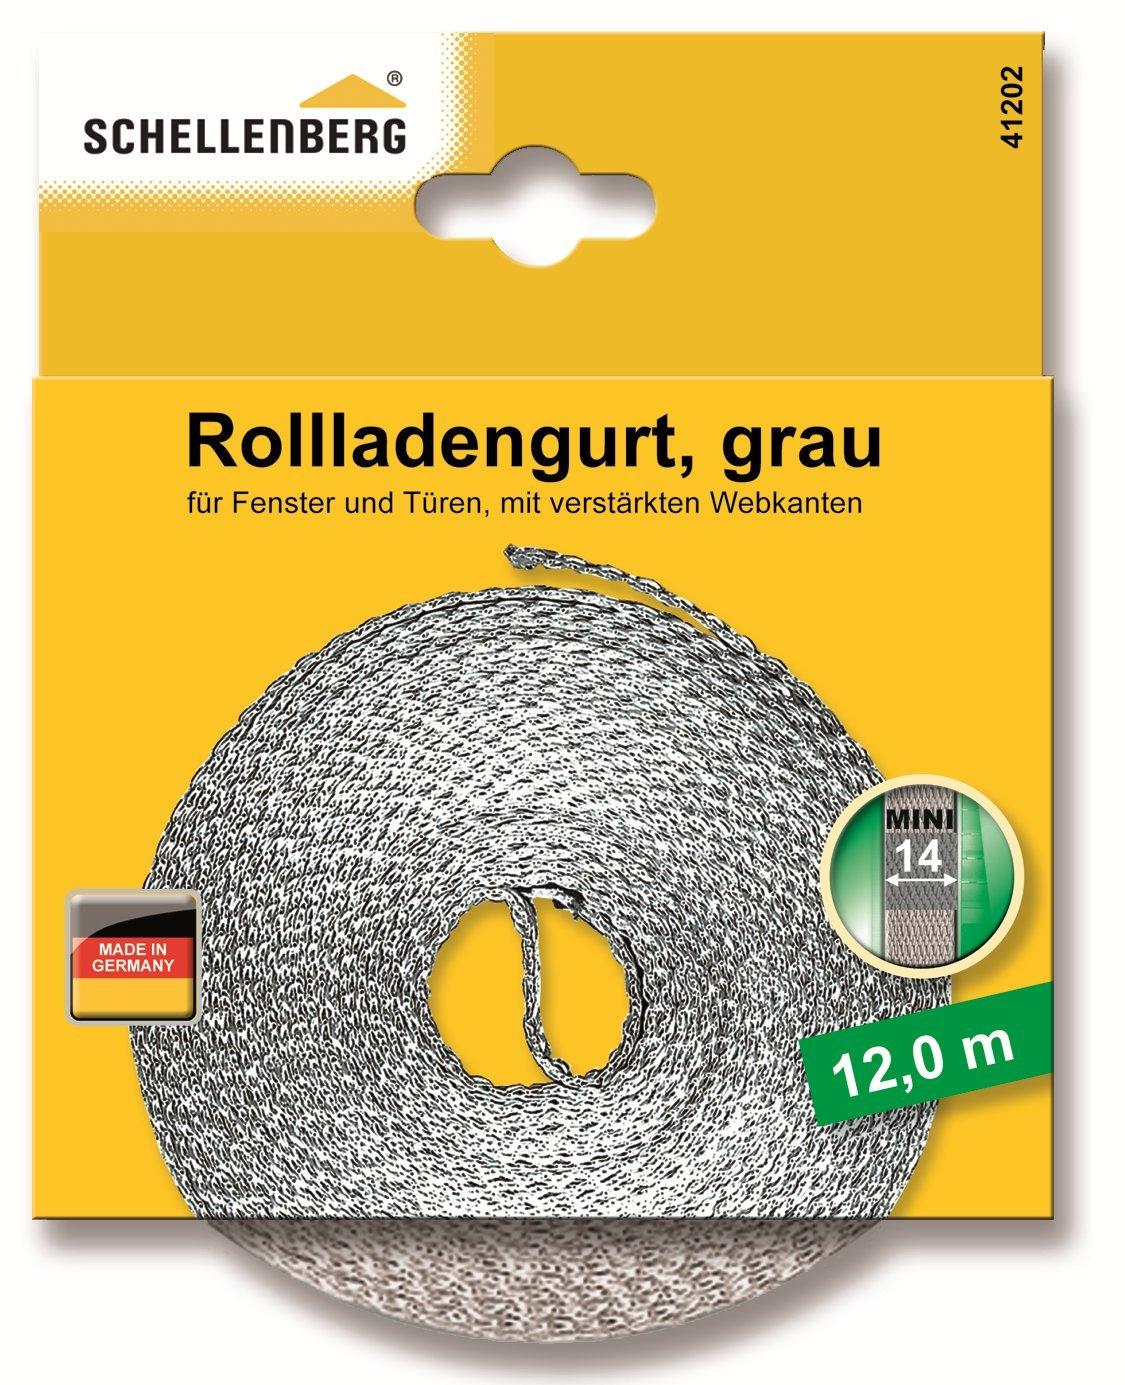 Schellenberg 41202 - Correa de persiana (14 mm, 12 m), color gris